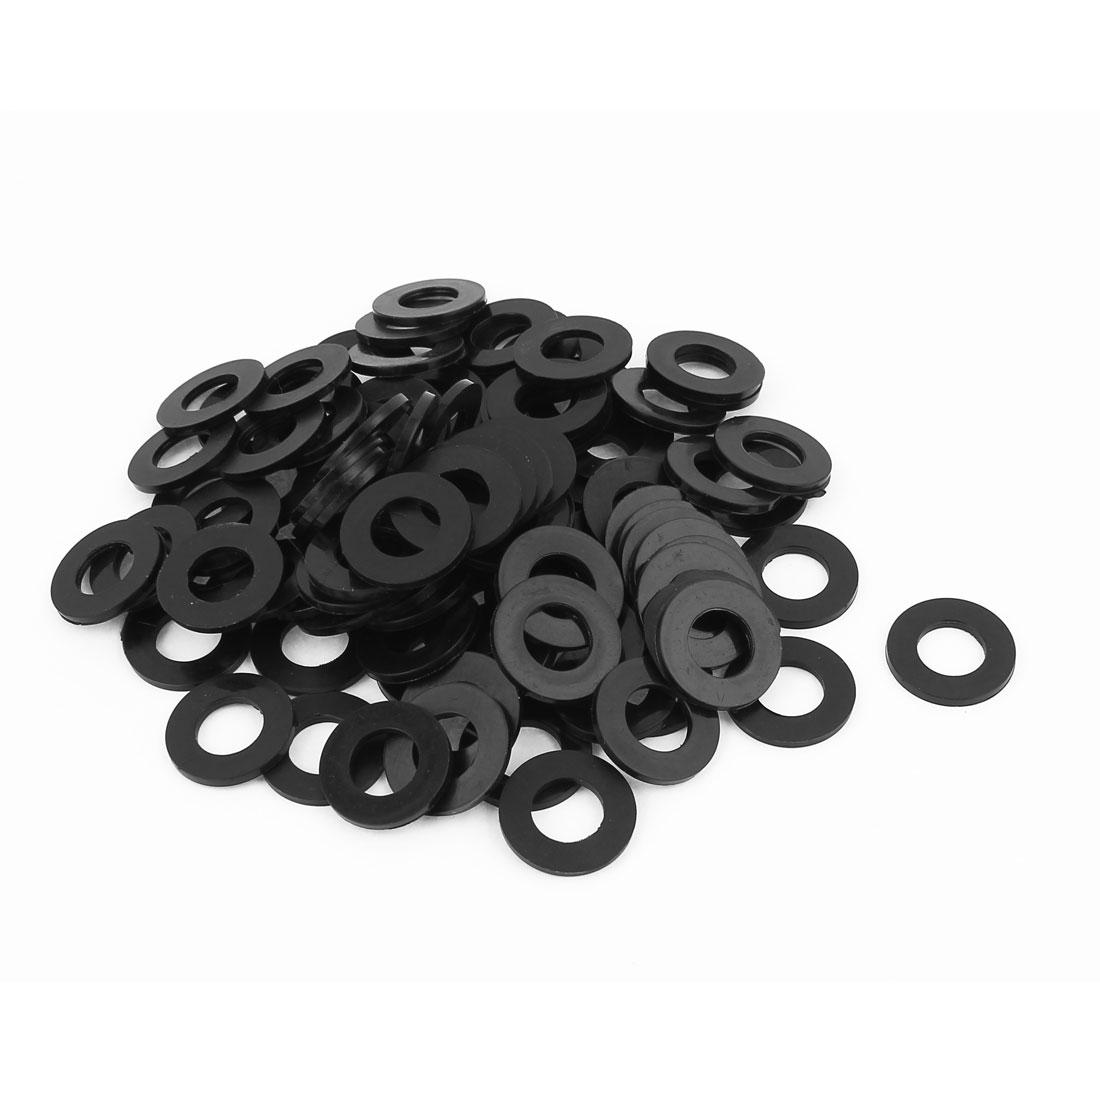 100 Pcs M12x24mmx2mm Plastic Round Flat Washer Gasket Seal Ring Black